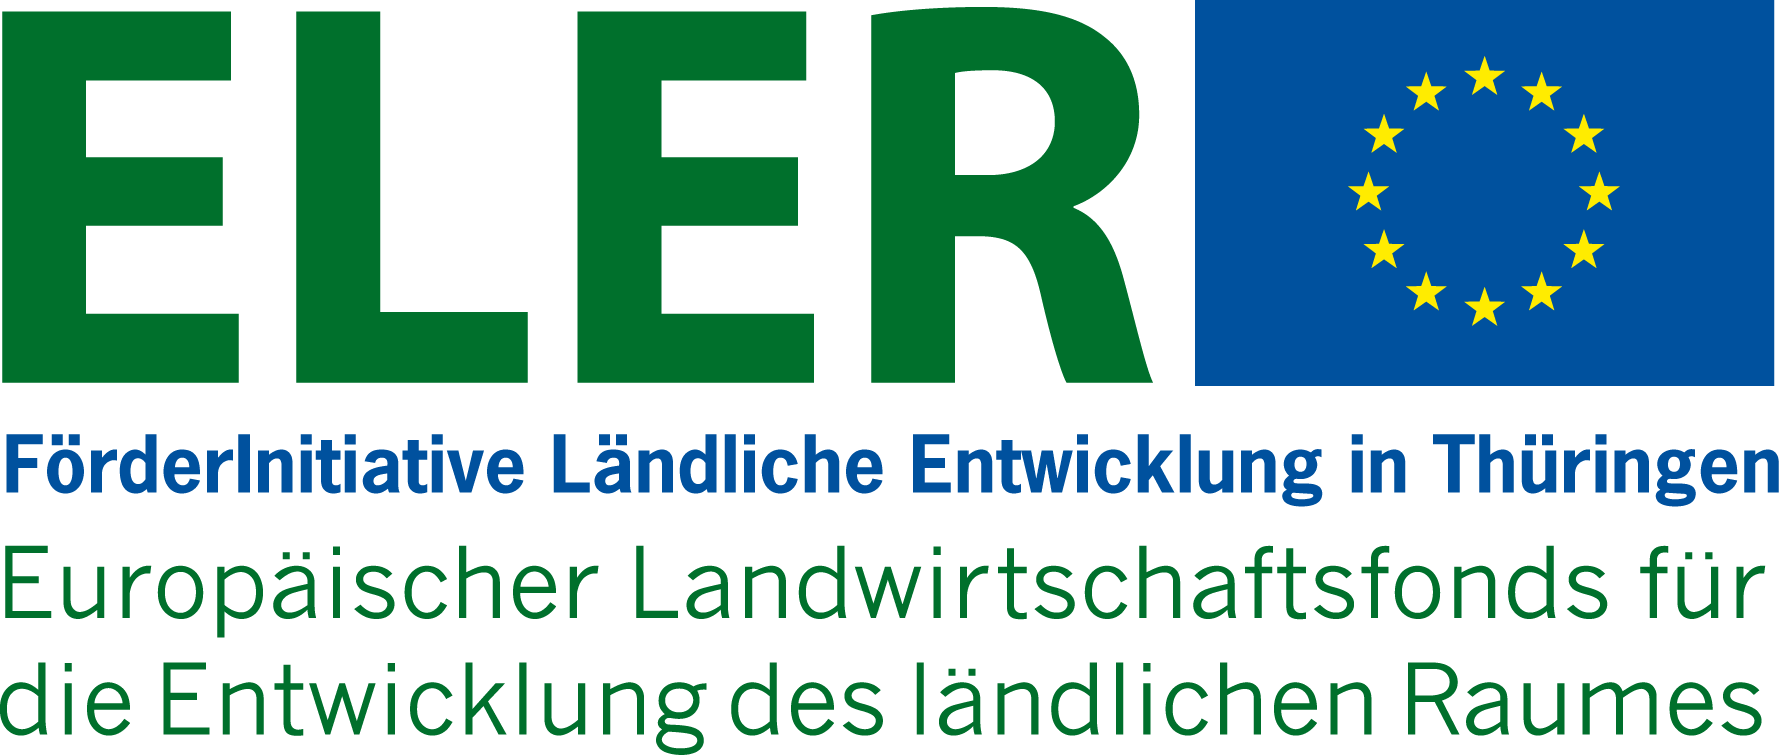 tl_files/eko/p/Projekte/Witra_THueringen/eler logo.png